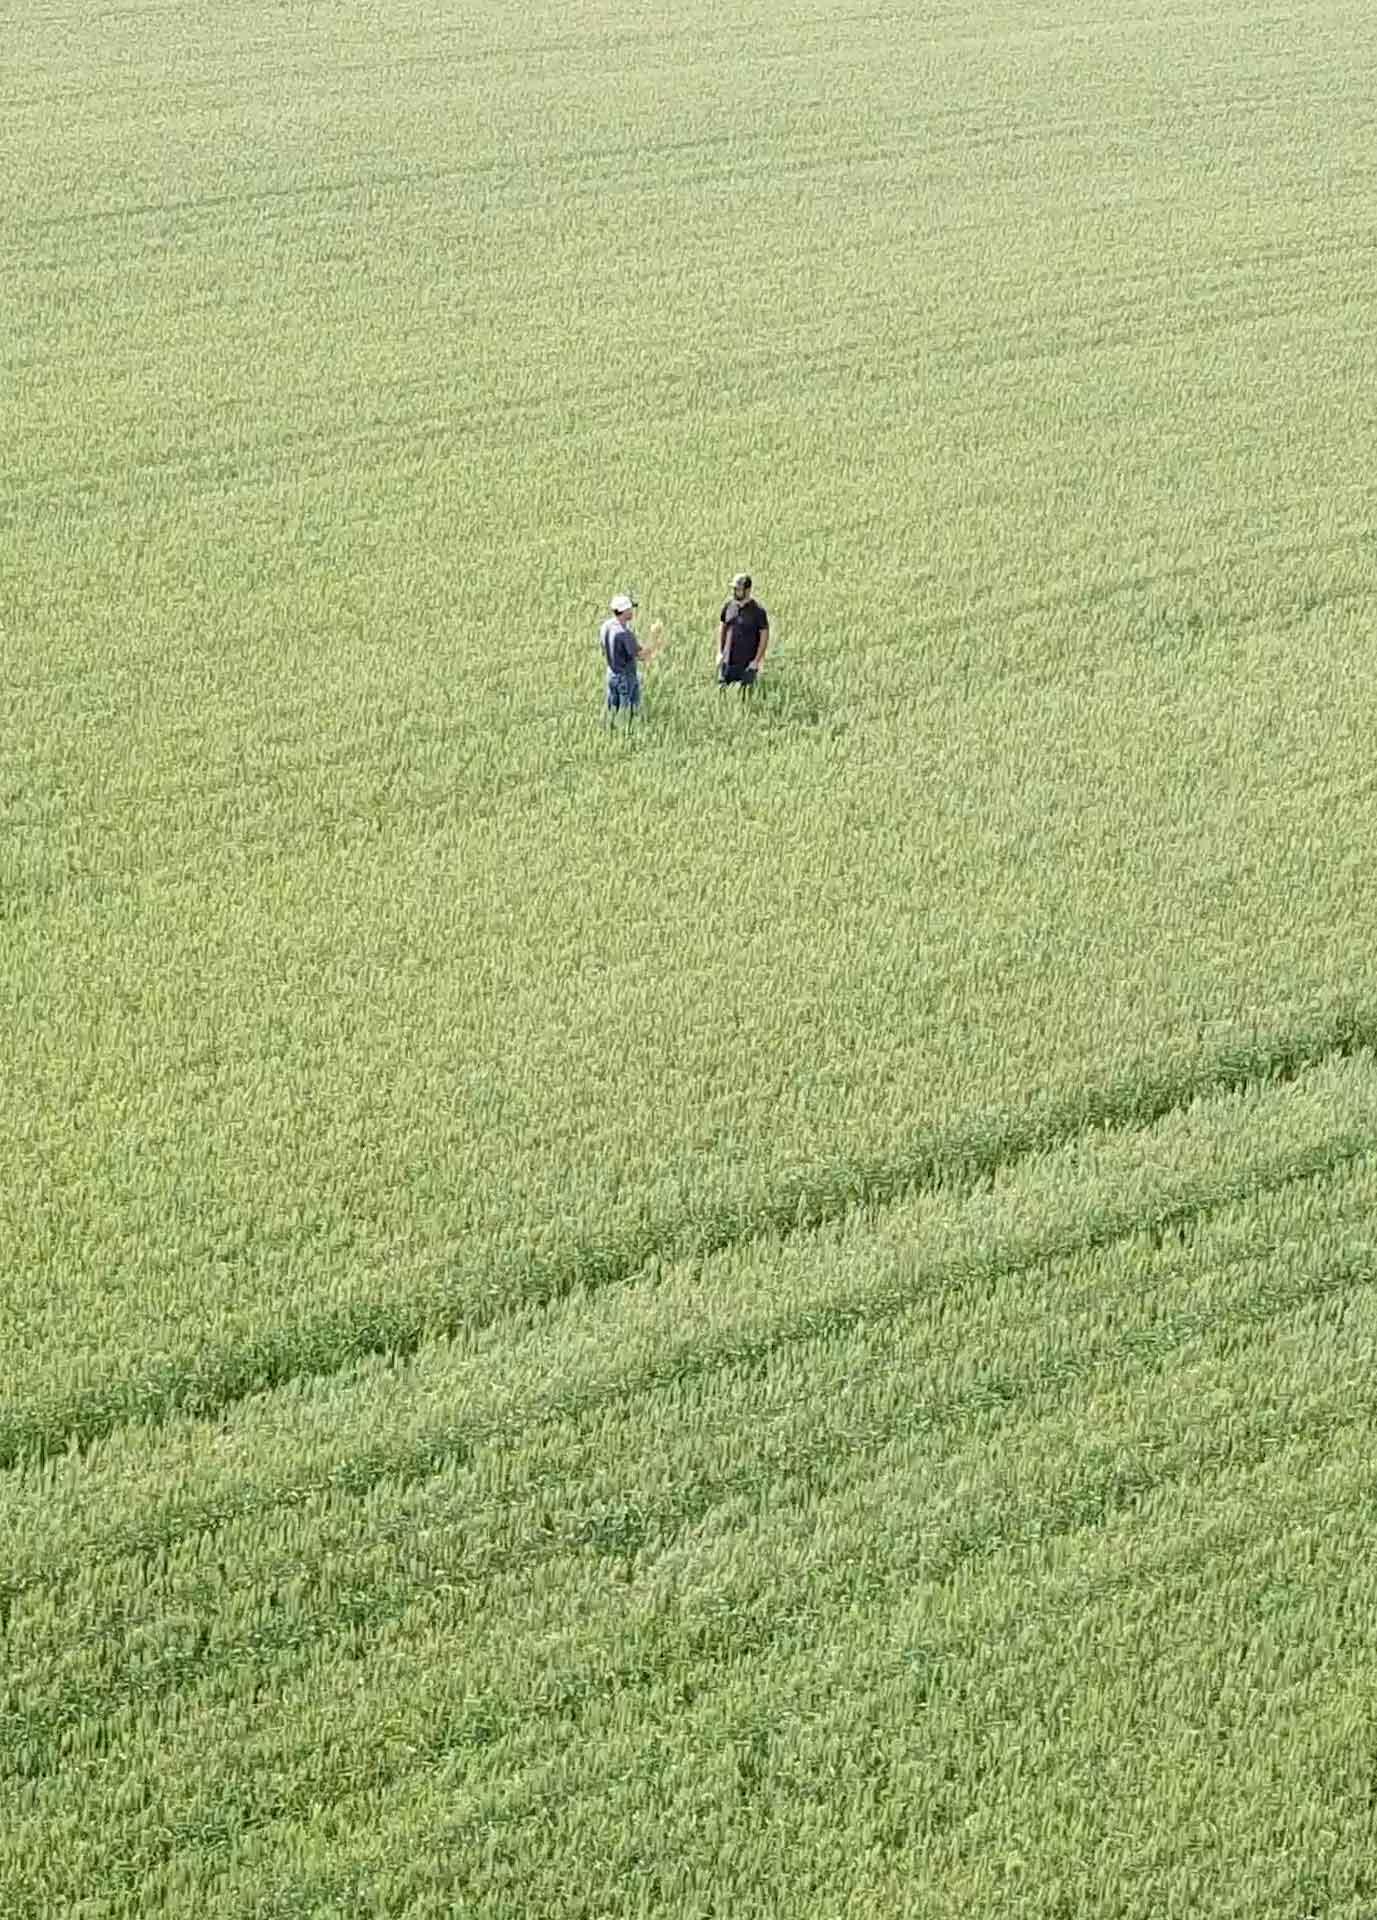 Background image of men standing in field